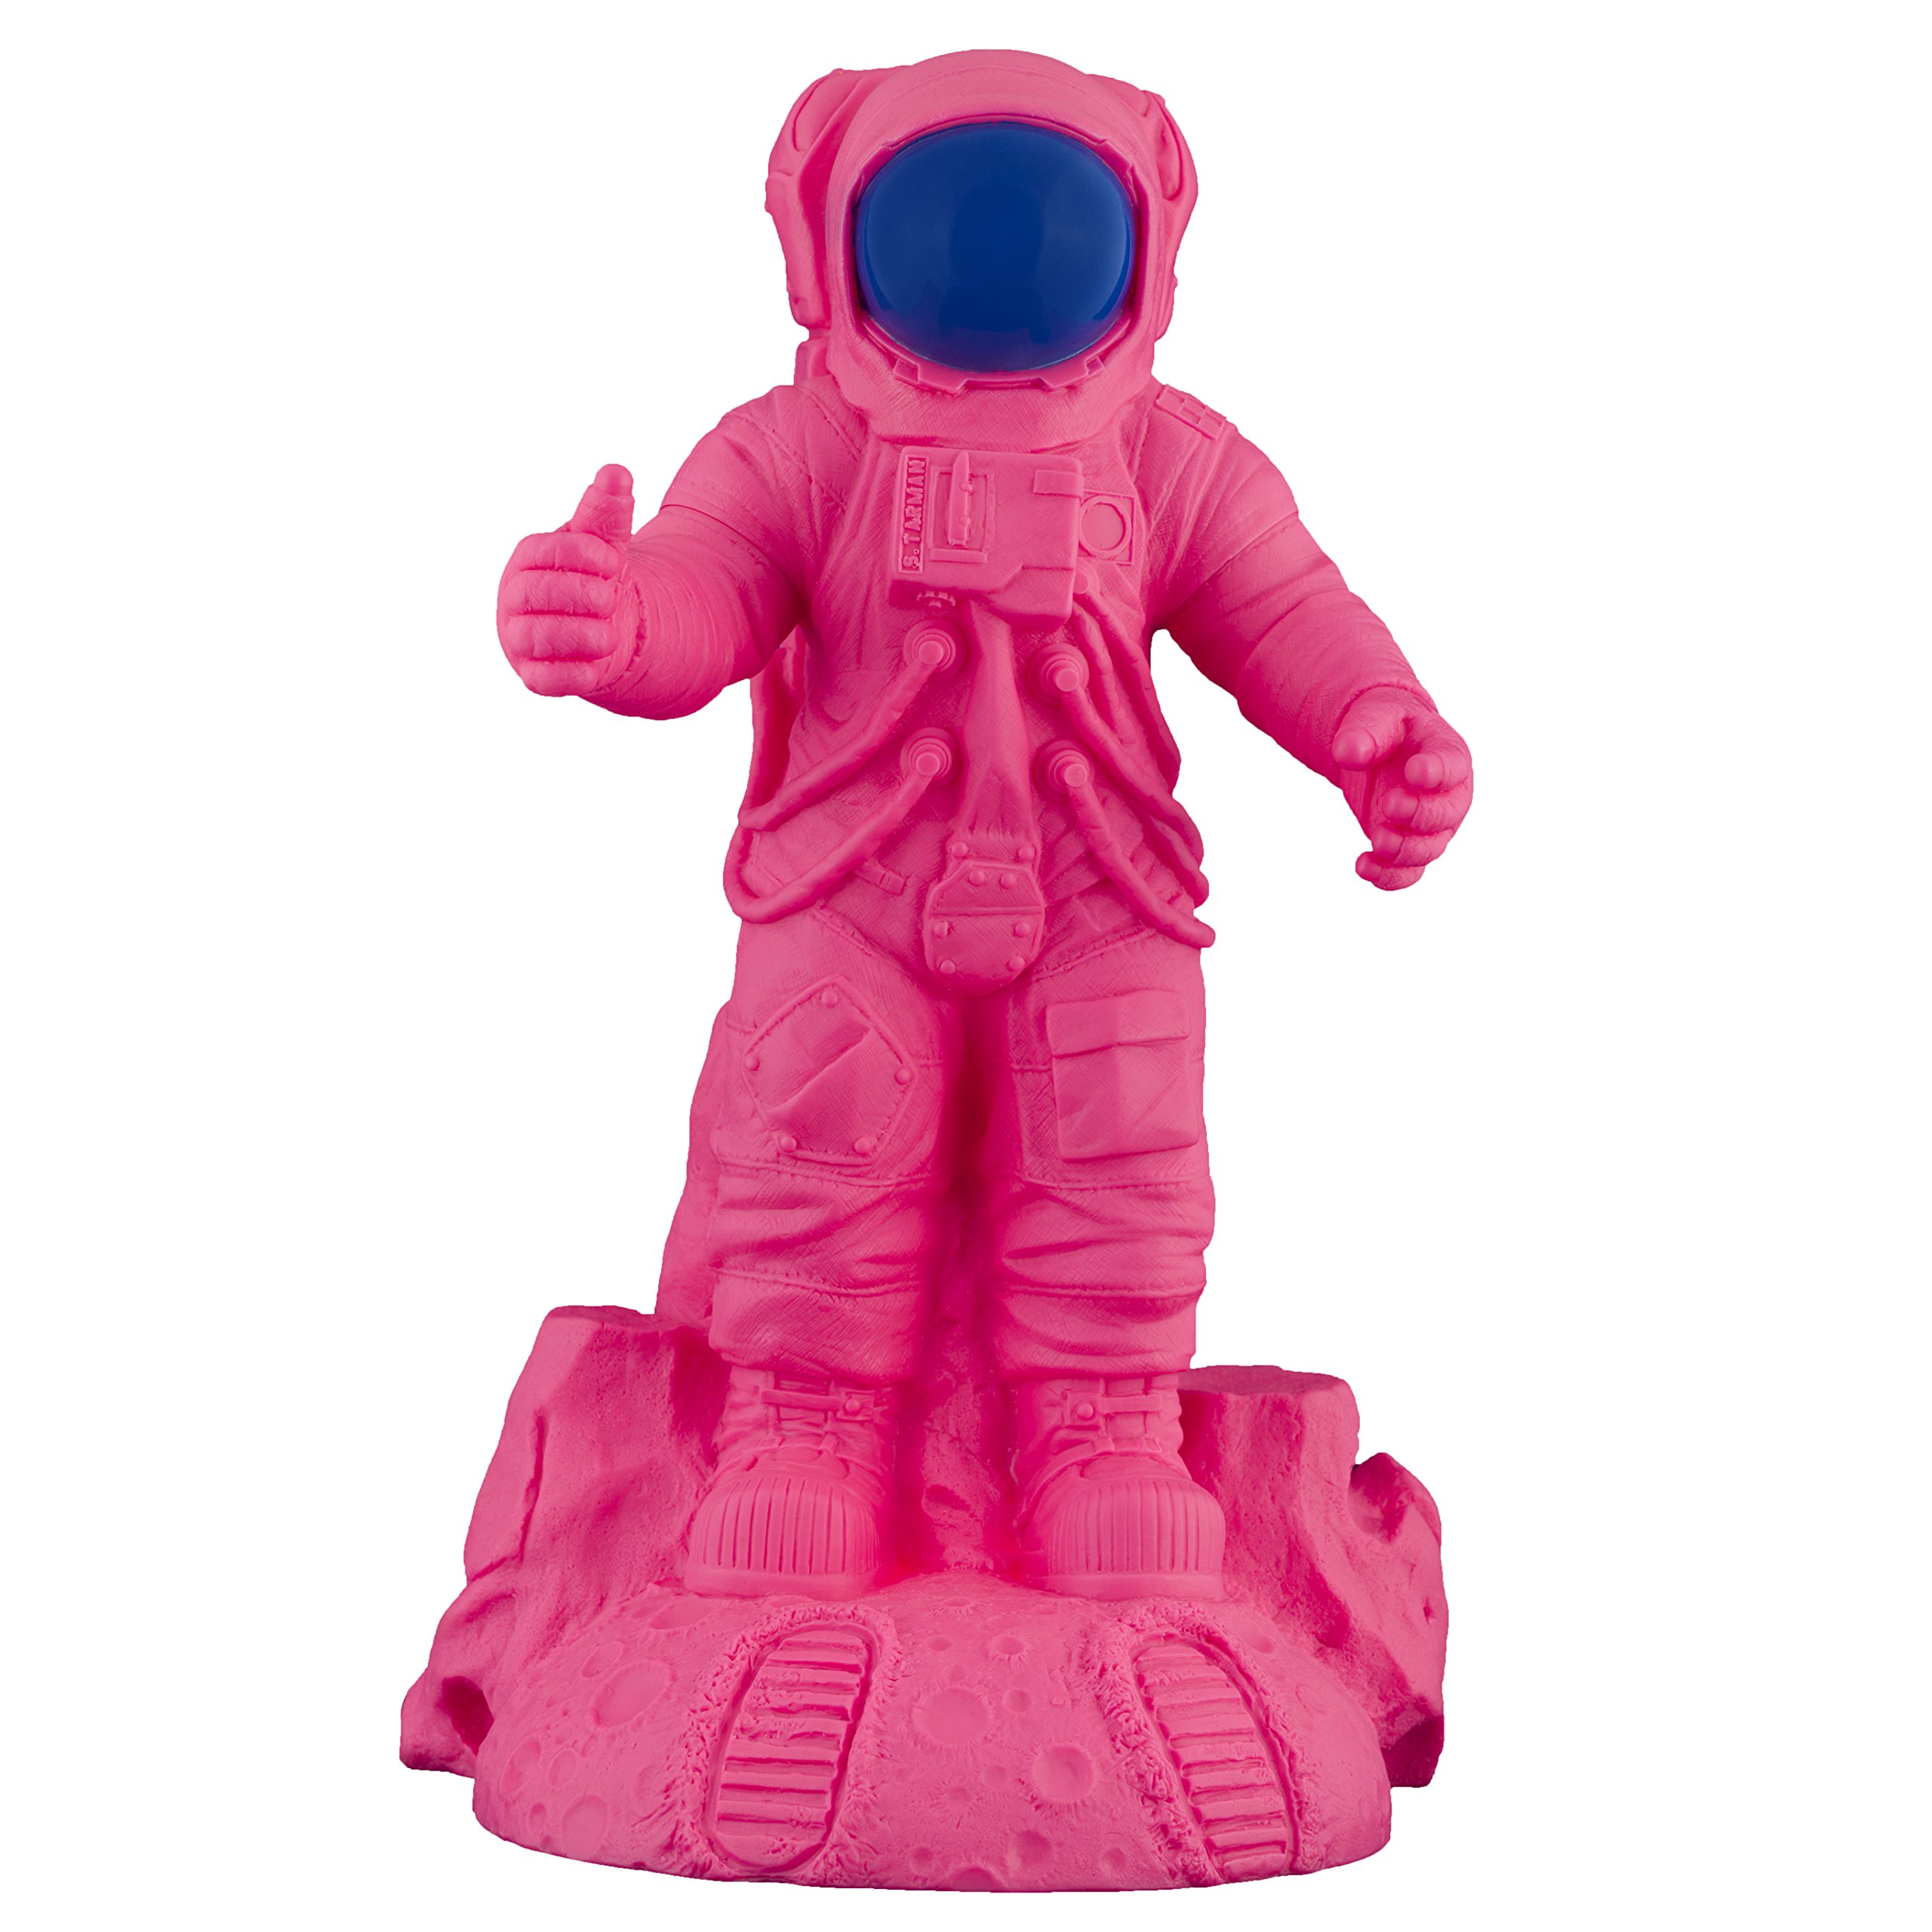 Goodnight Light Starman Lamp, Pink